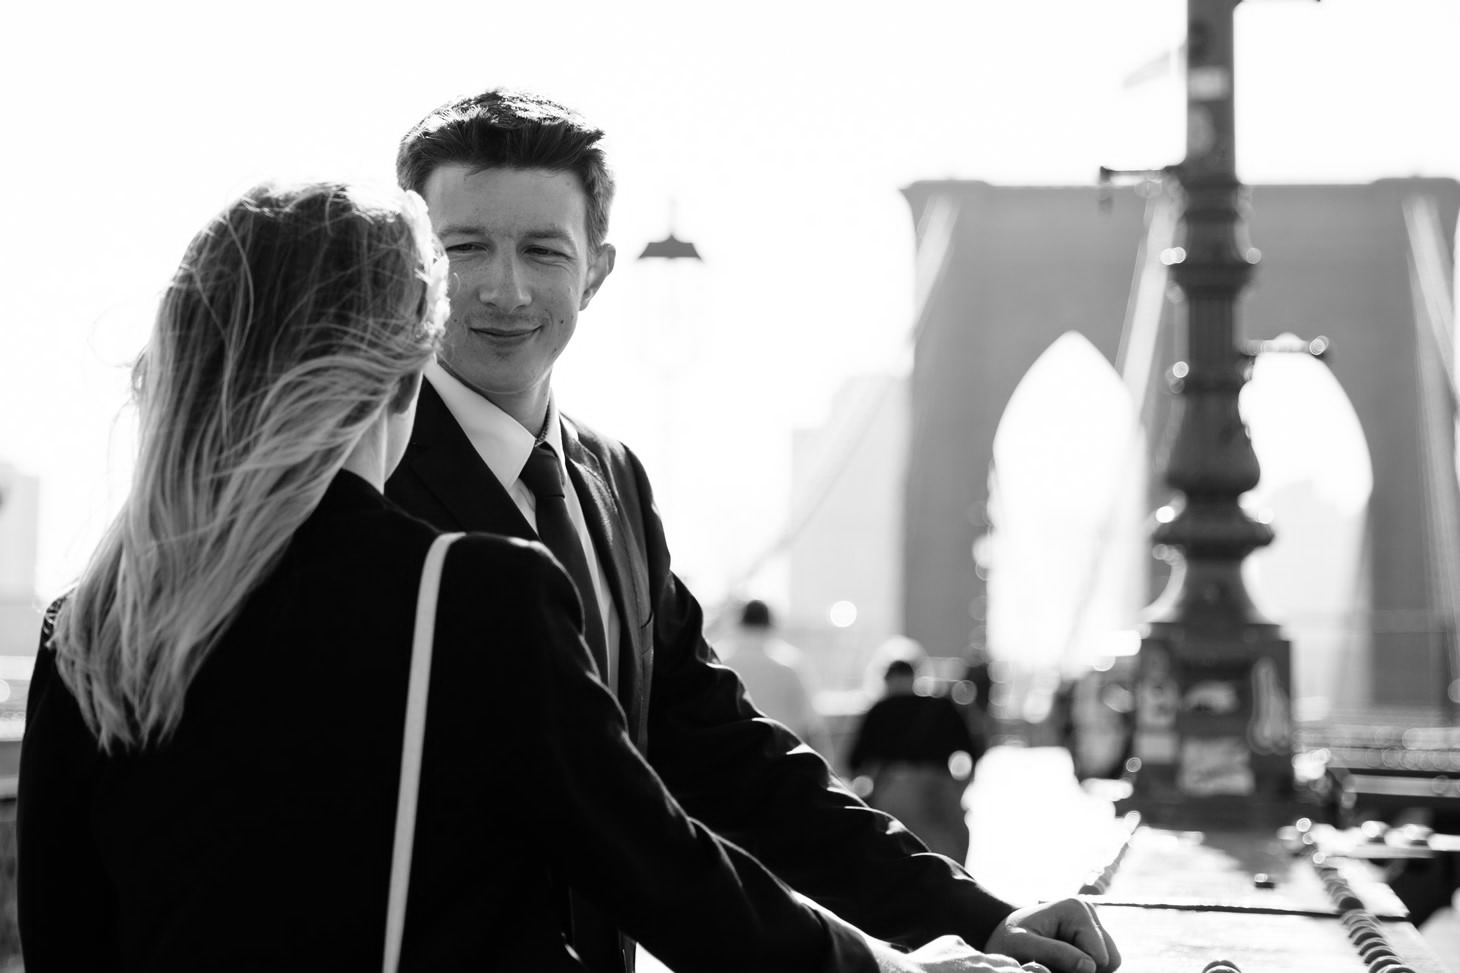 nyc-wedding-photographer-brooklyn-bridge-smitten-chickens-photo014.jpg